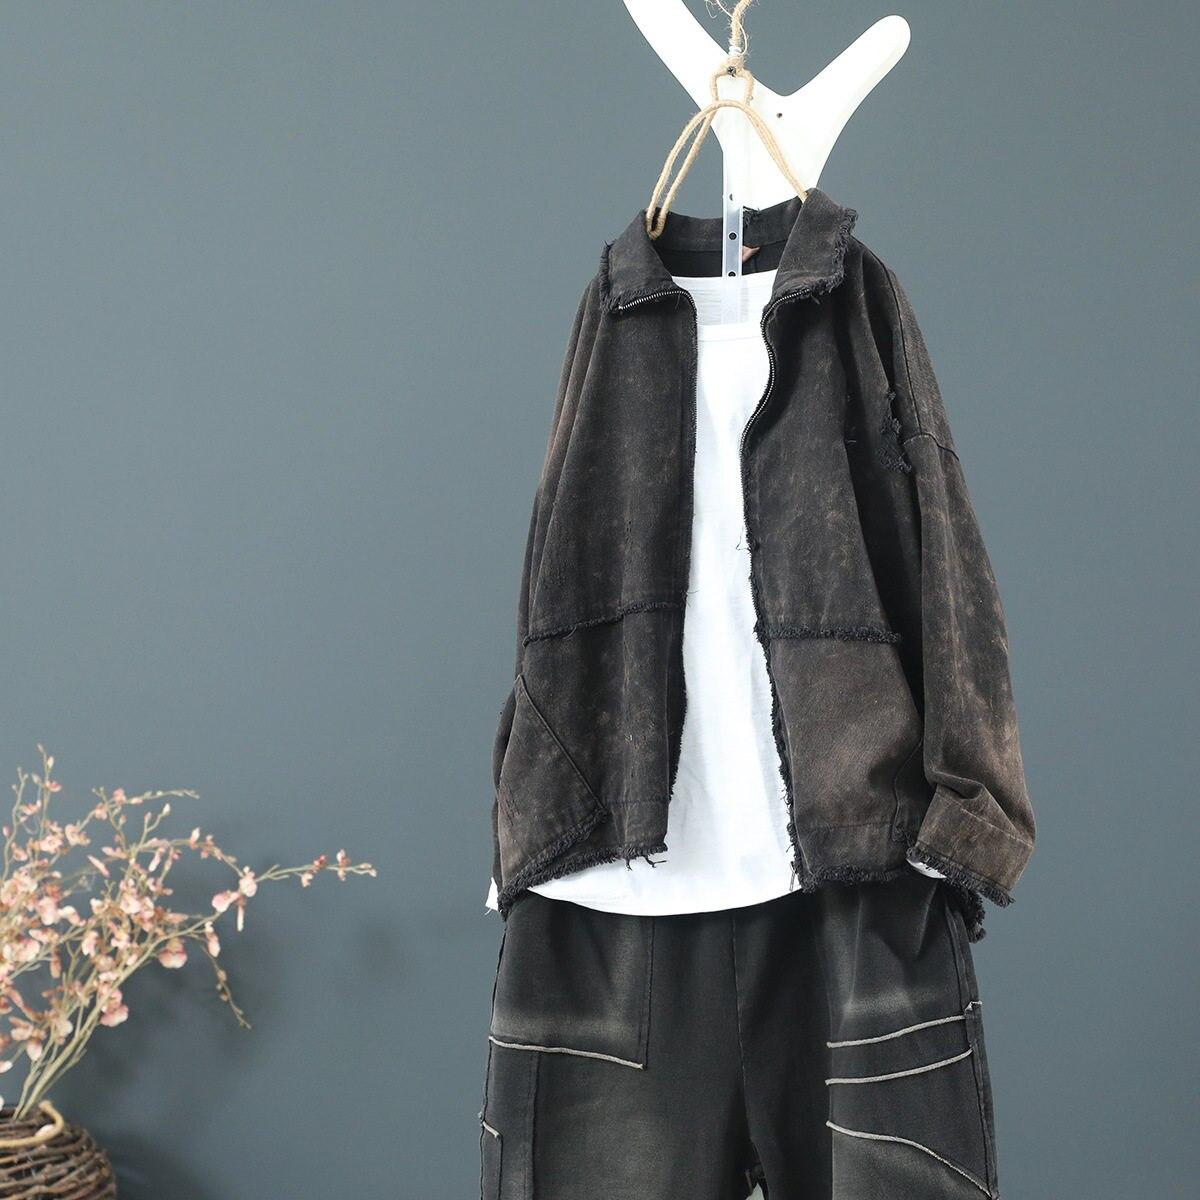 denali hippie boho jas damen mantel manteaux femme jassen